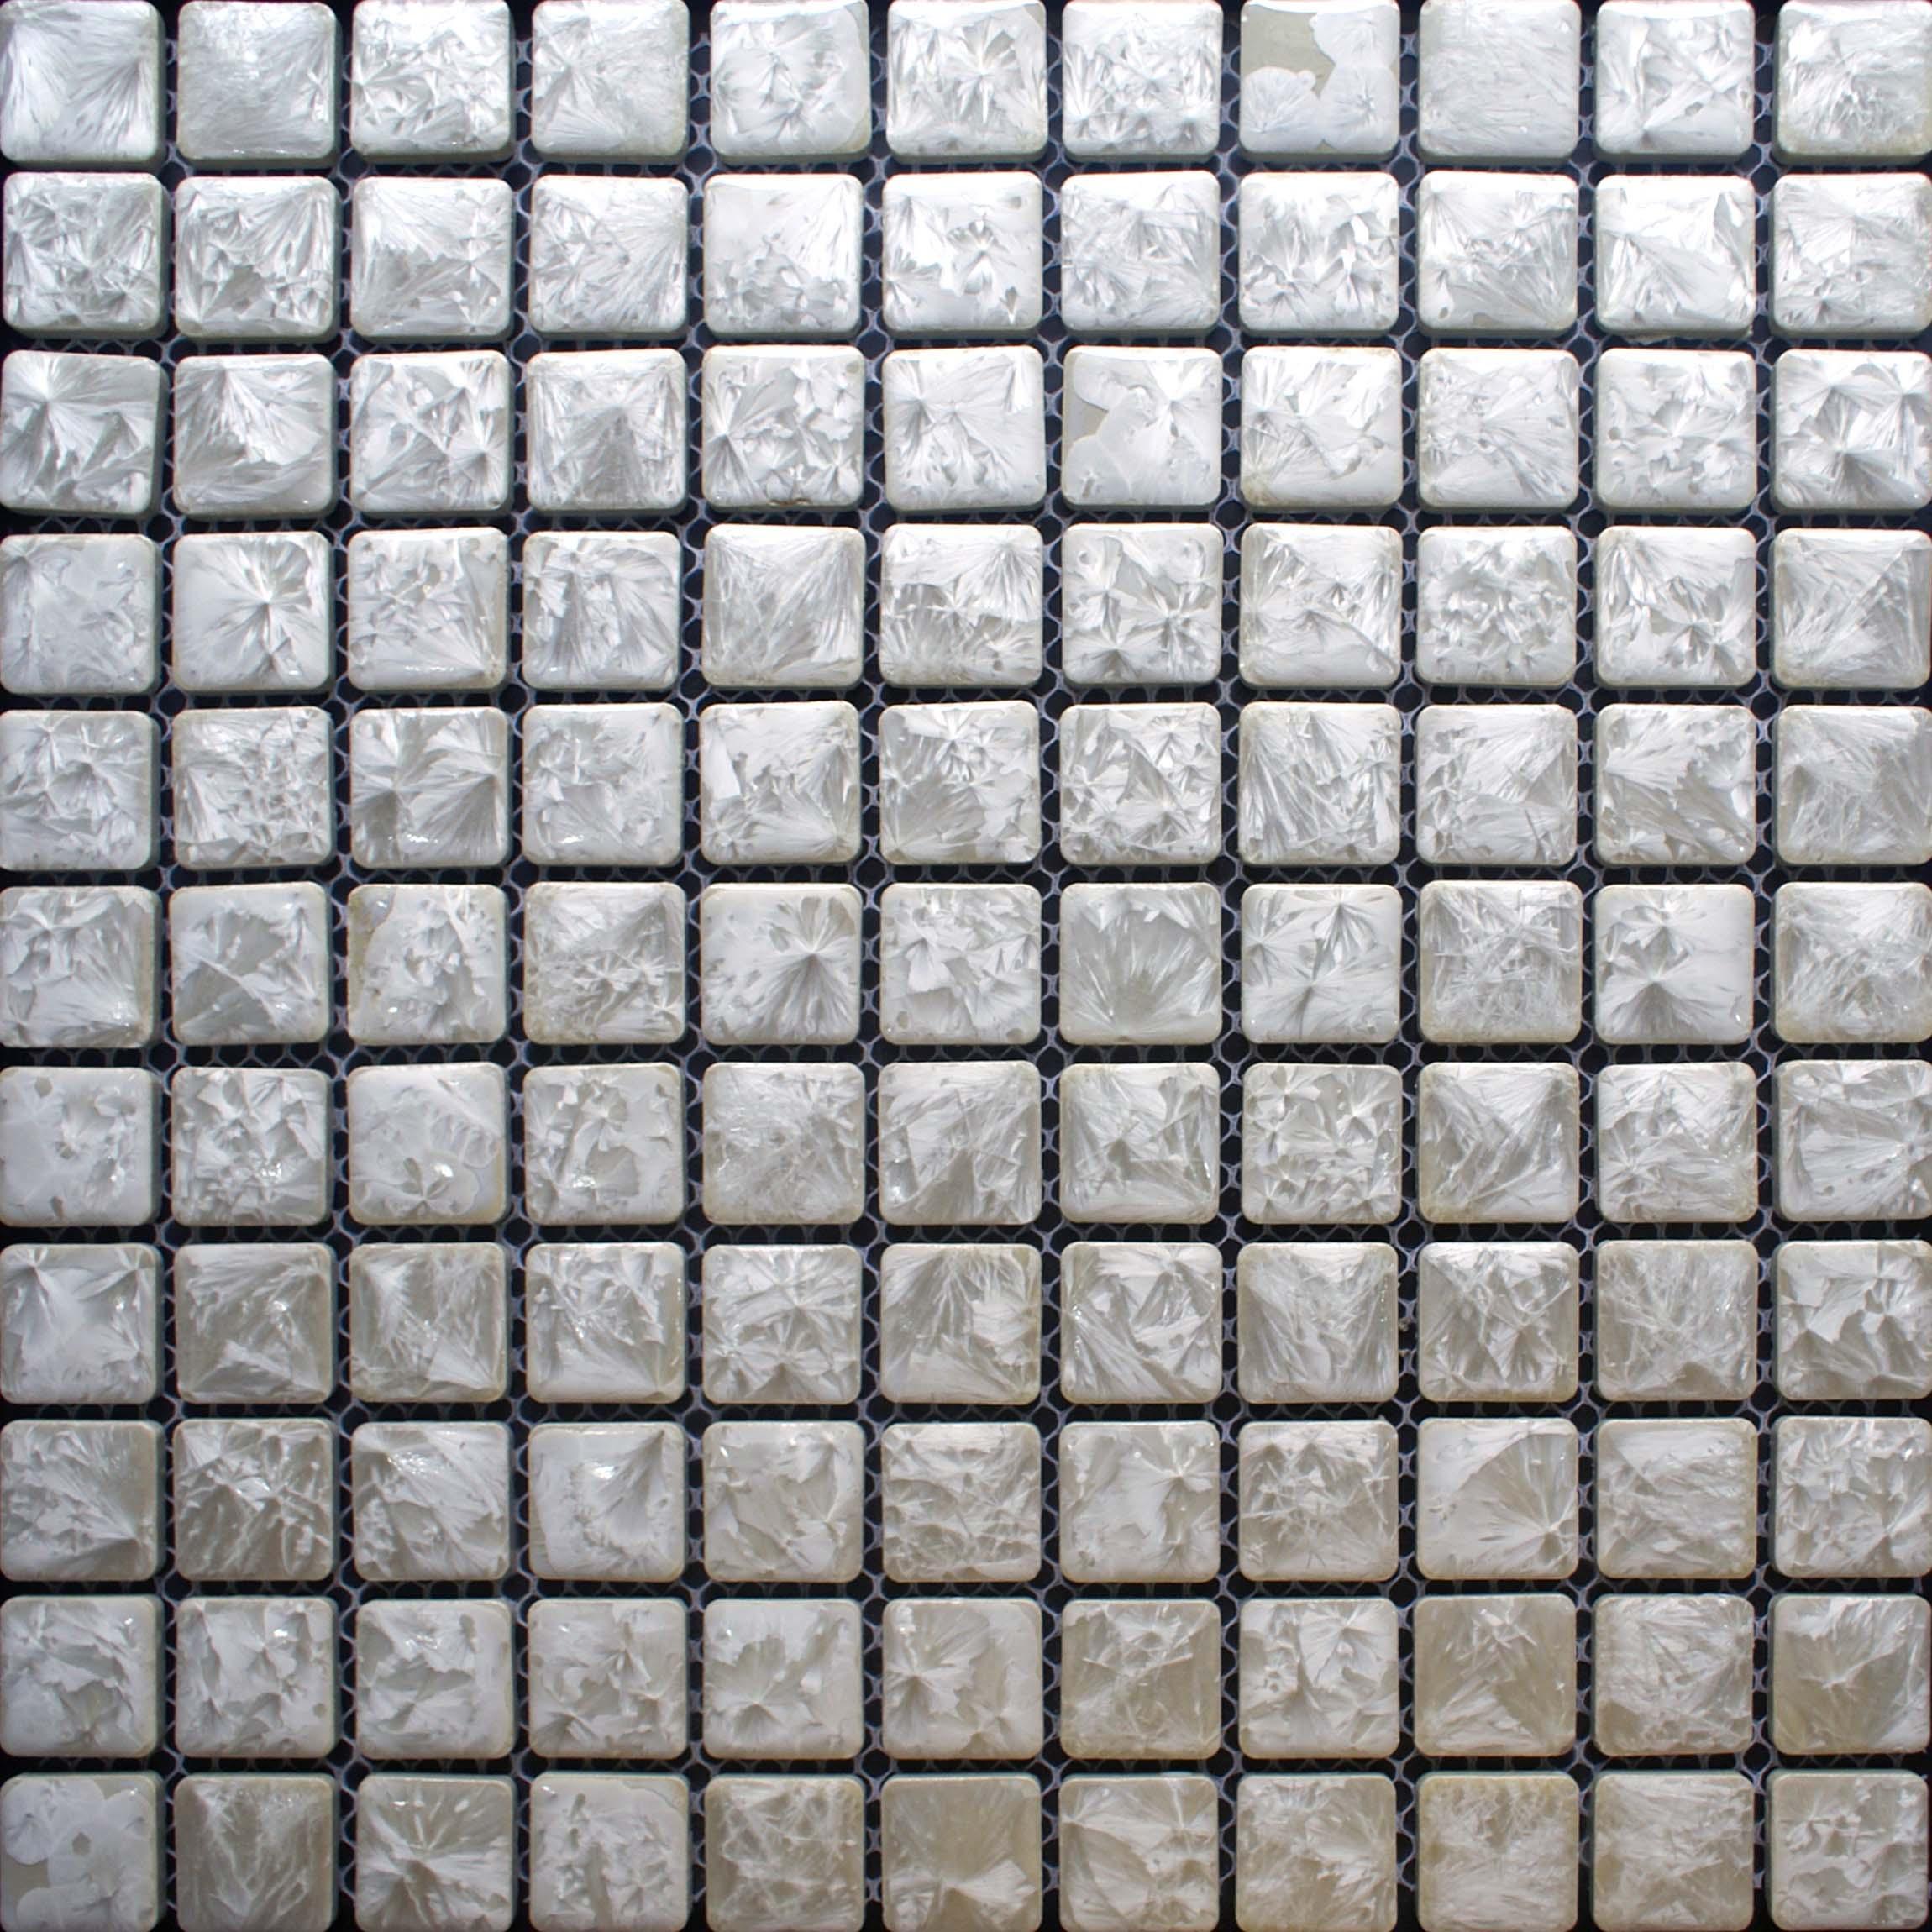 Art Décor: Porcelain Mosaic Tile Backsplash Bathroom Wall Decor Tiles